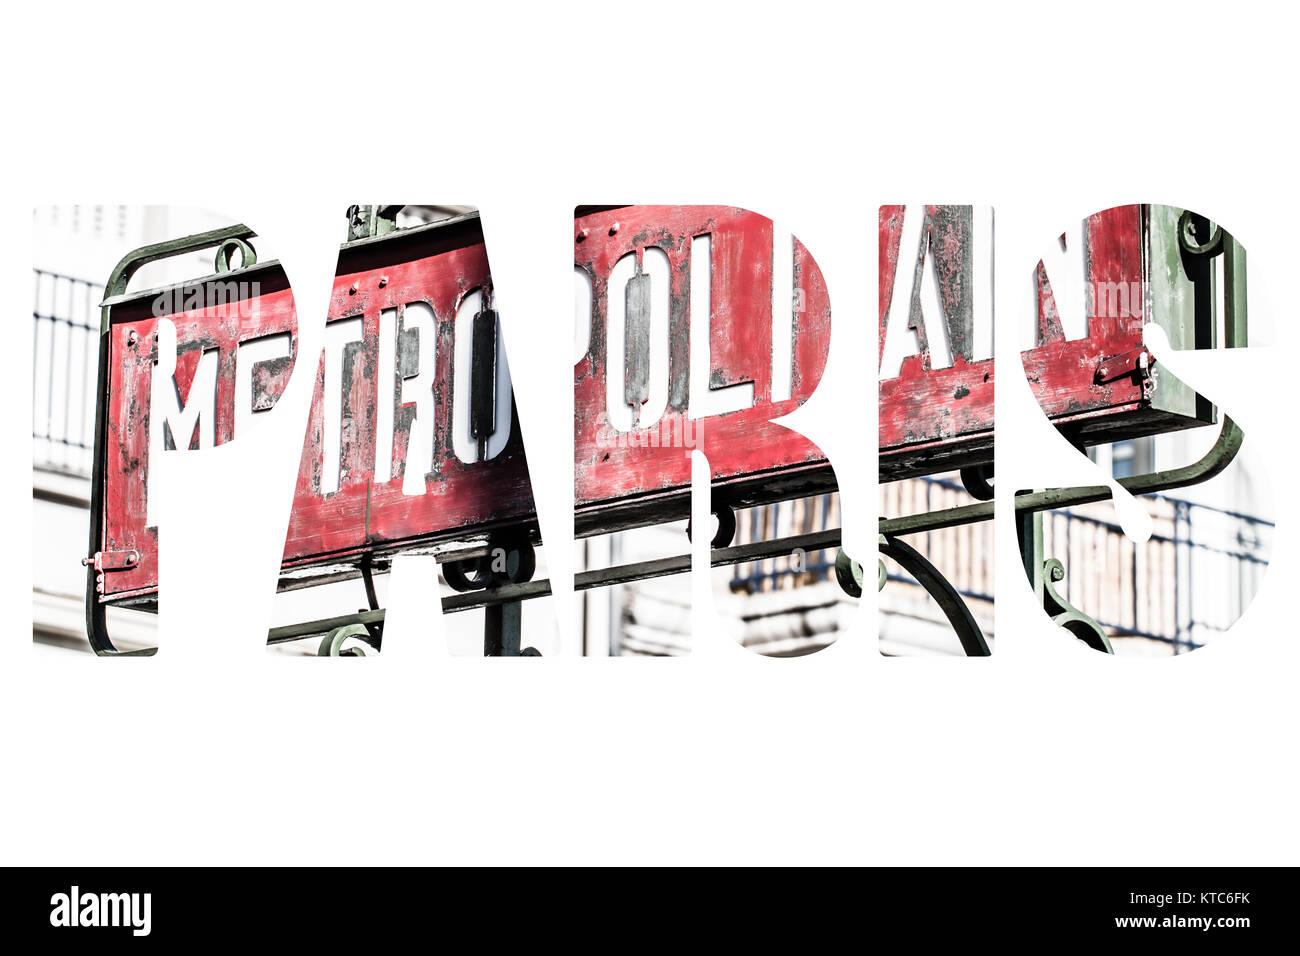 Paris Metro Metropolitain Sign - Stock Image